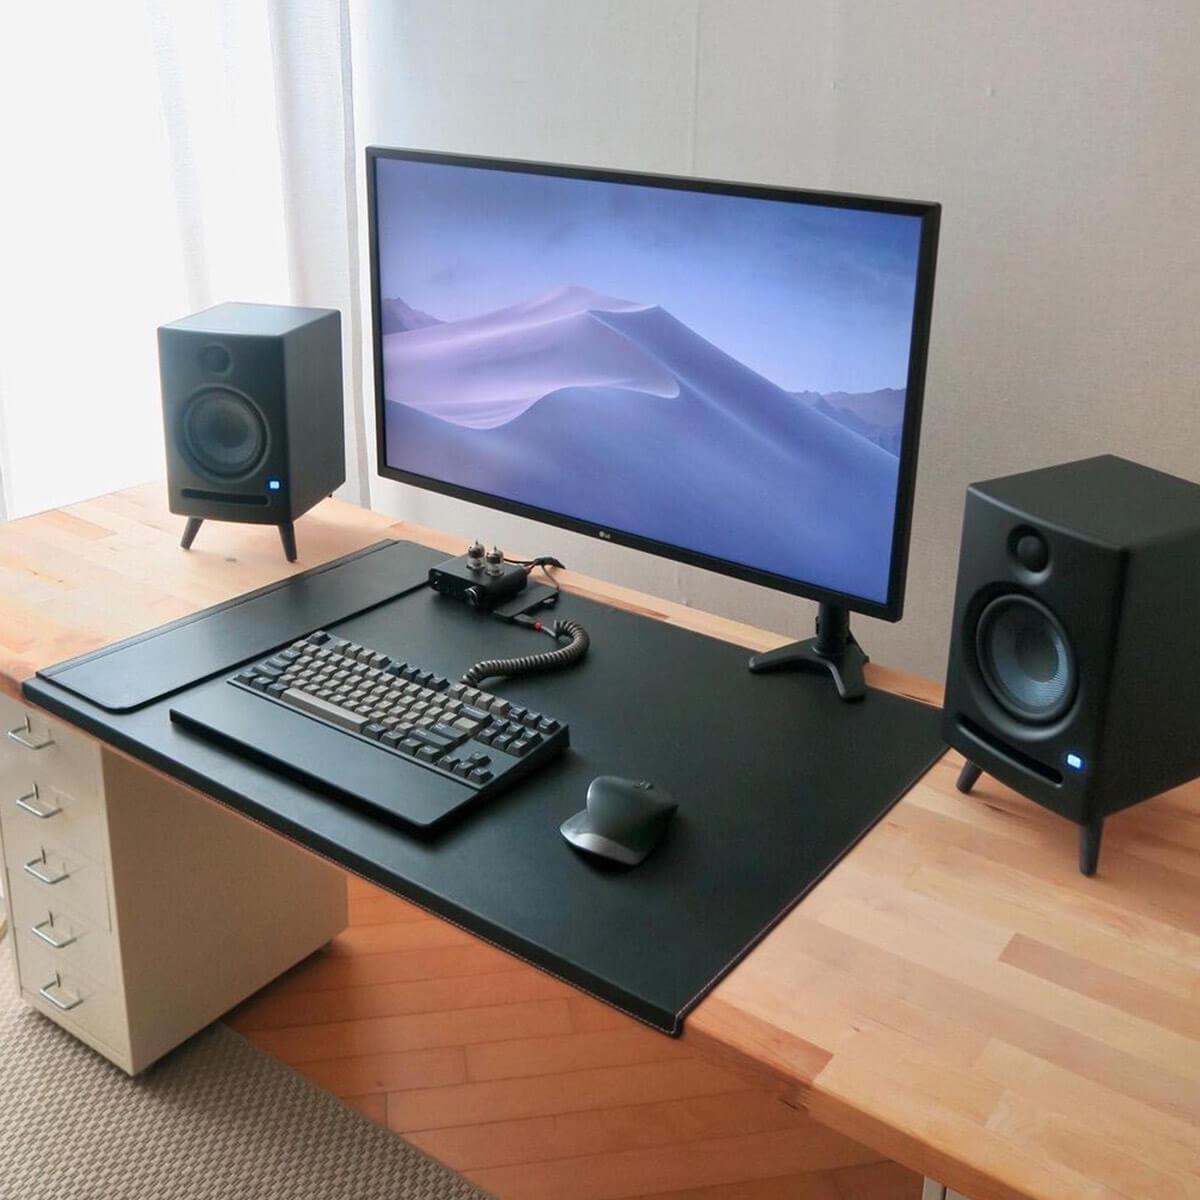 Gaming Desk Pads & Wrist Rests